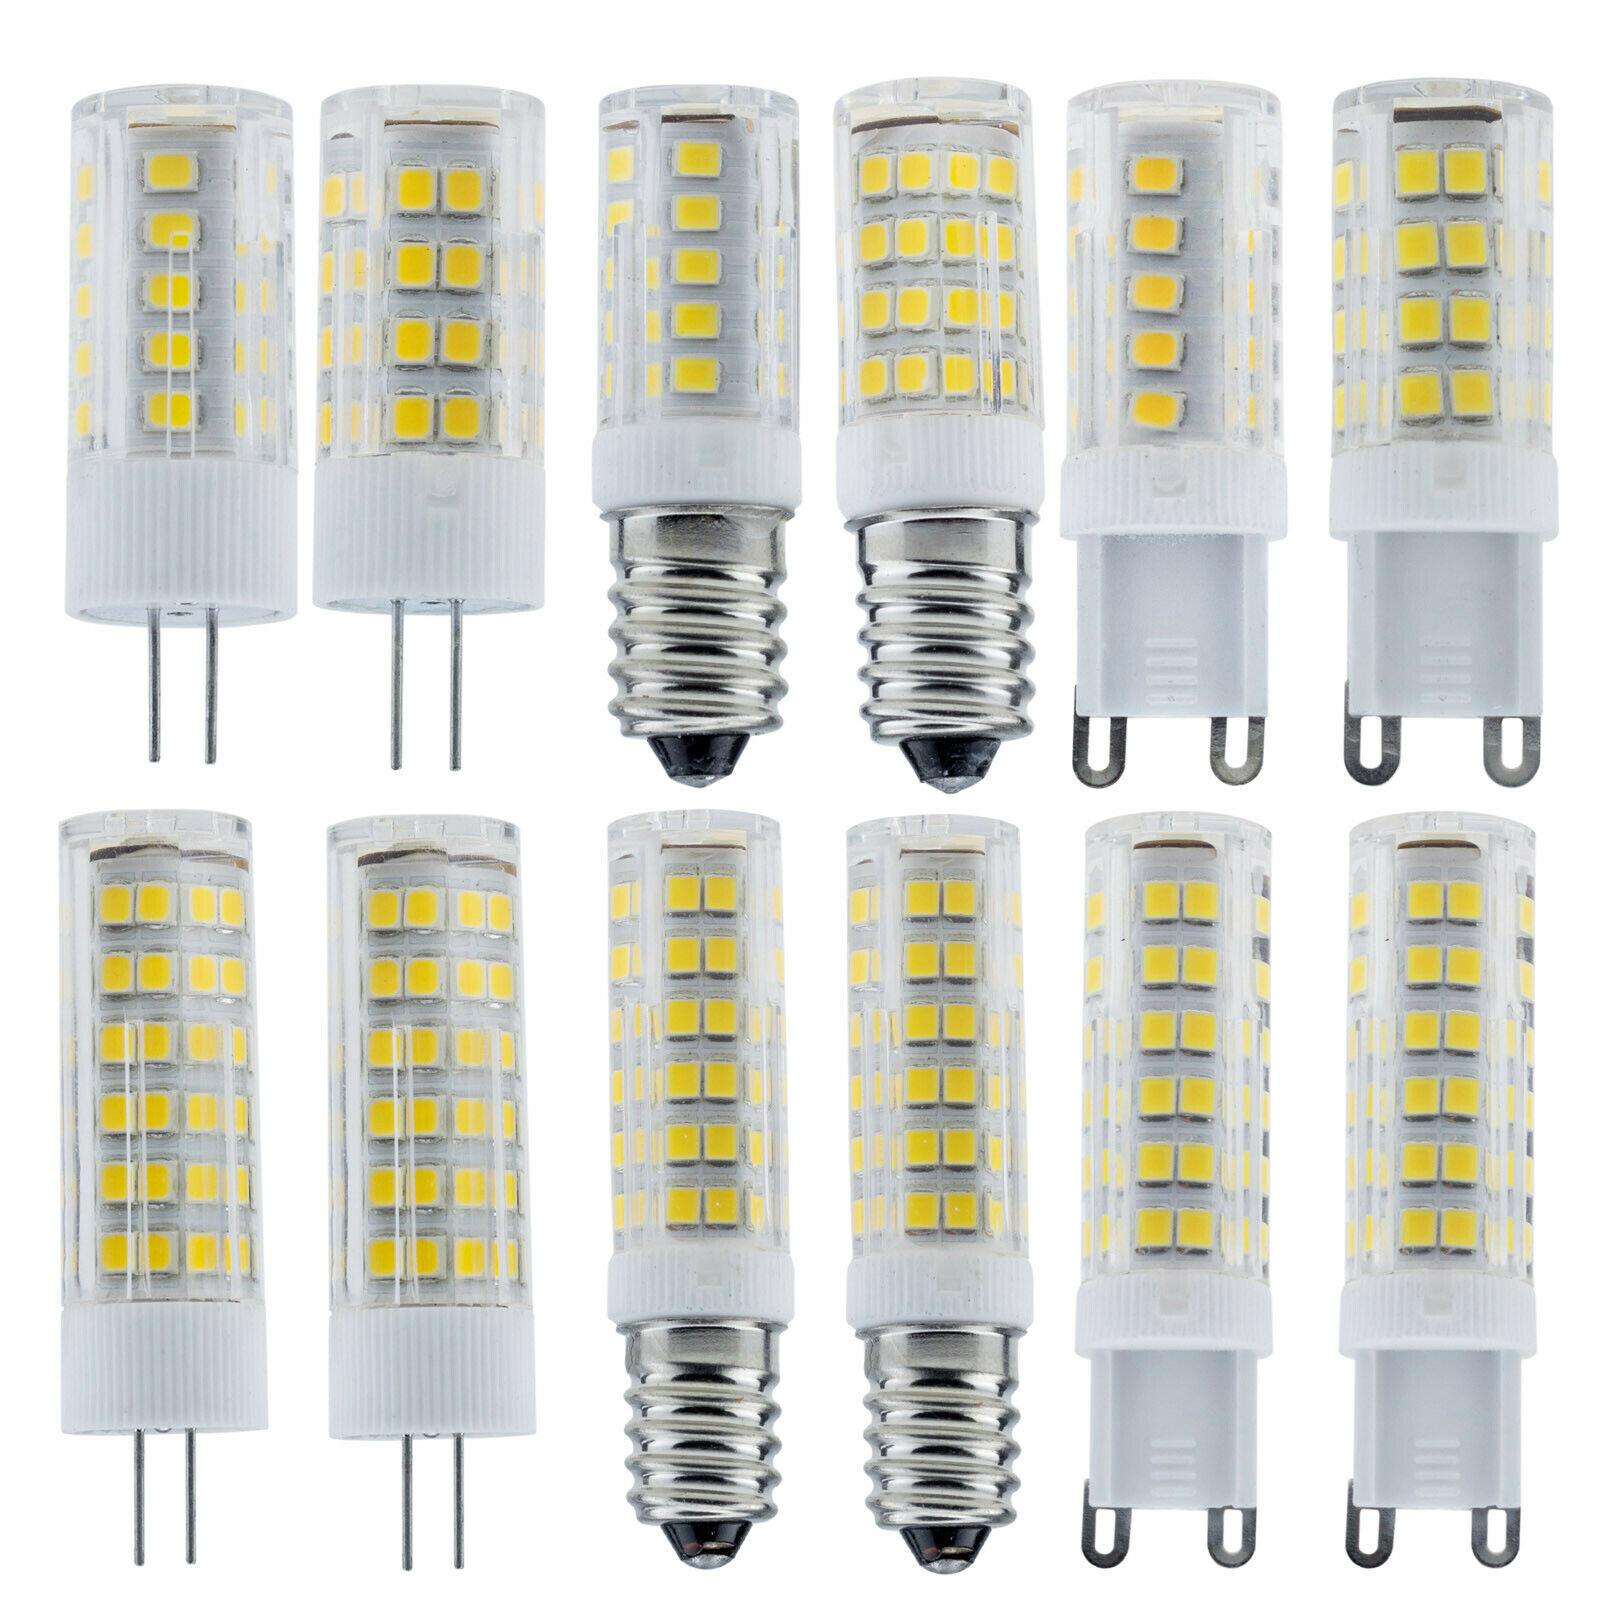 2X LED Corn Bulb G9 High Lumens Lights 2835SMD 220V 3W//5W Wall Mounts Lamps 13E